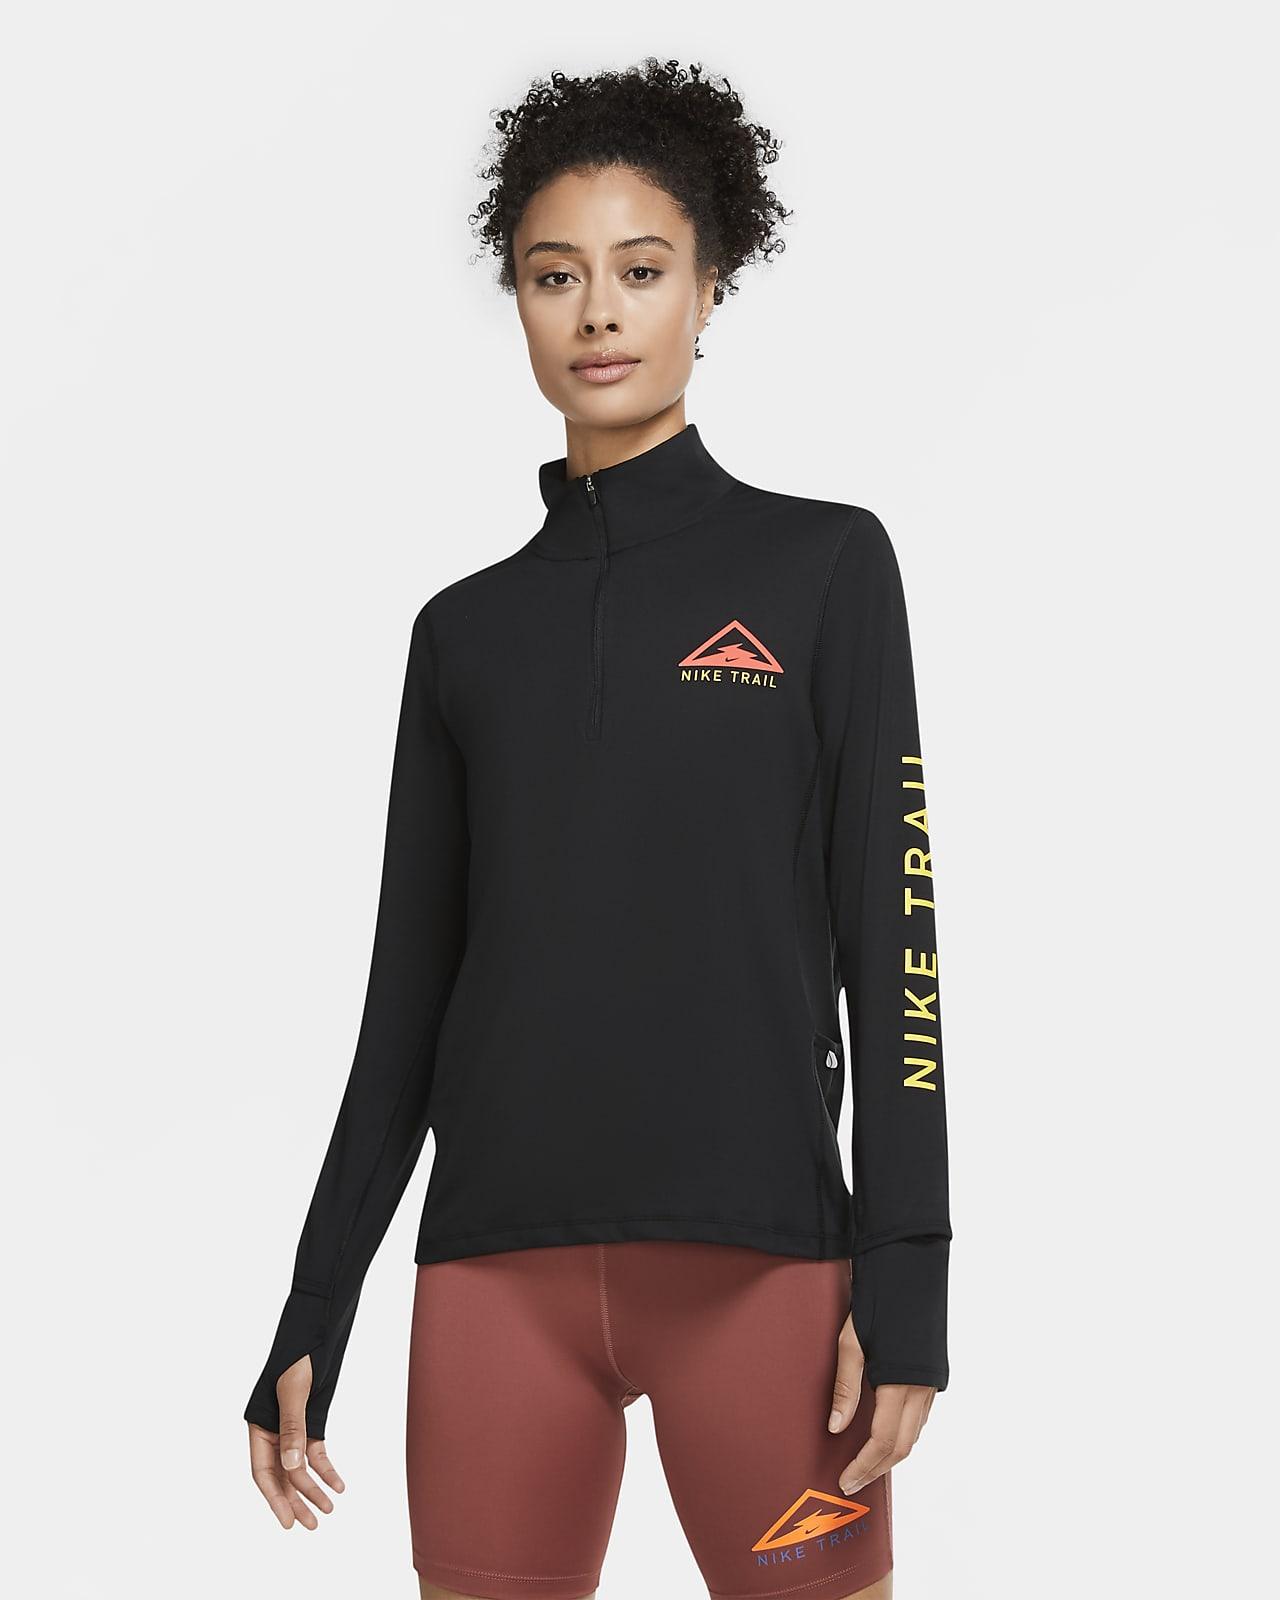 Nike Women's 1/2-Zip Trail Running Top